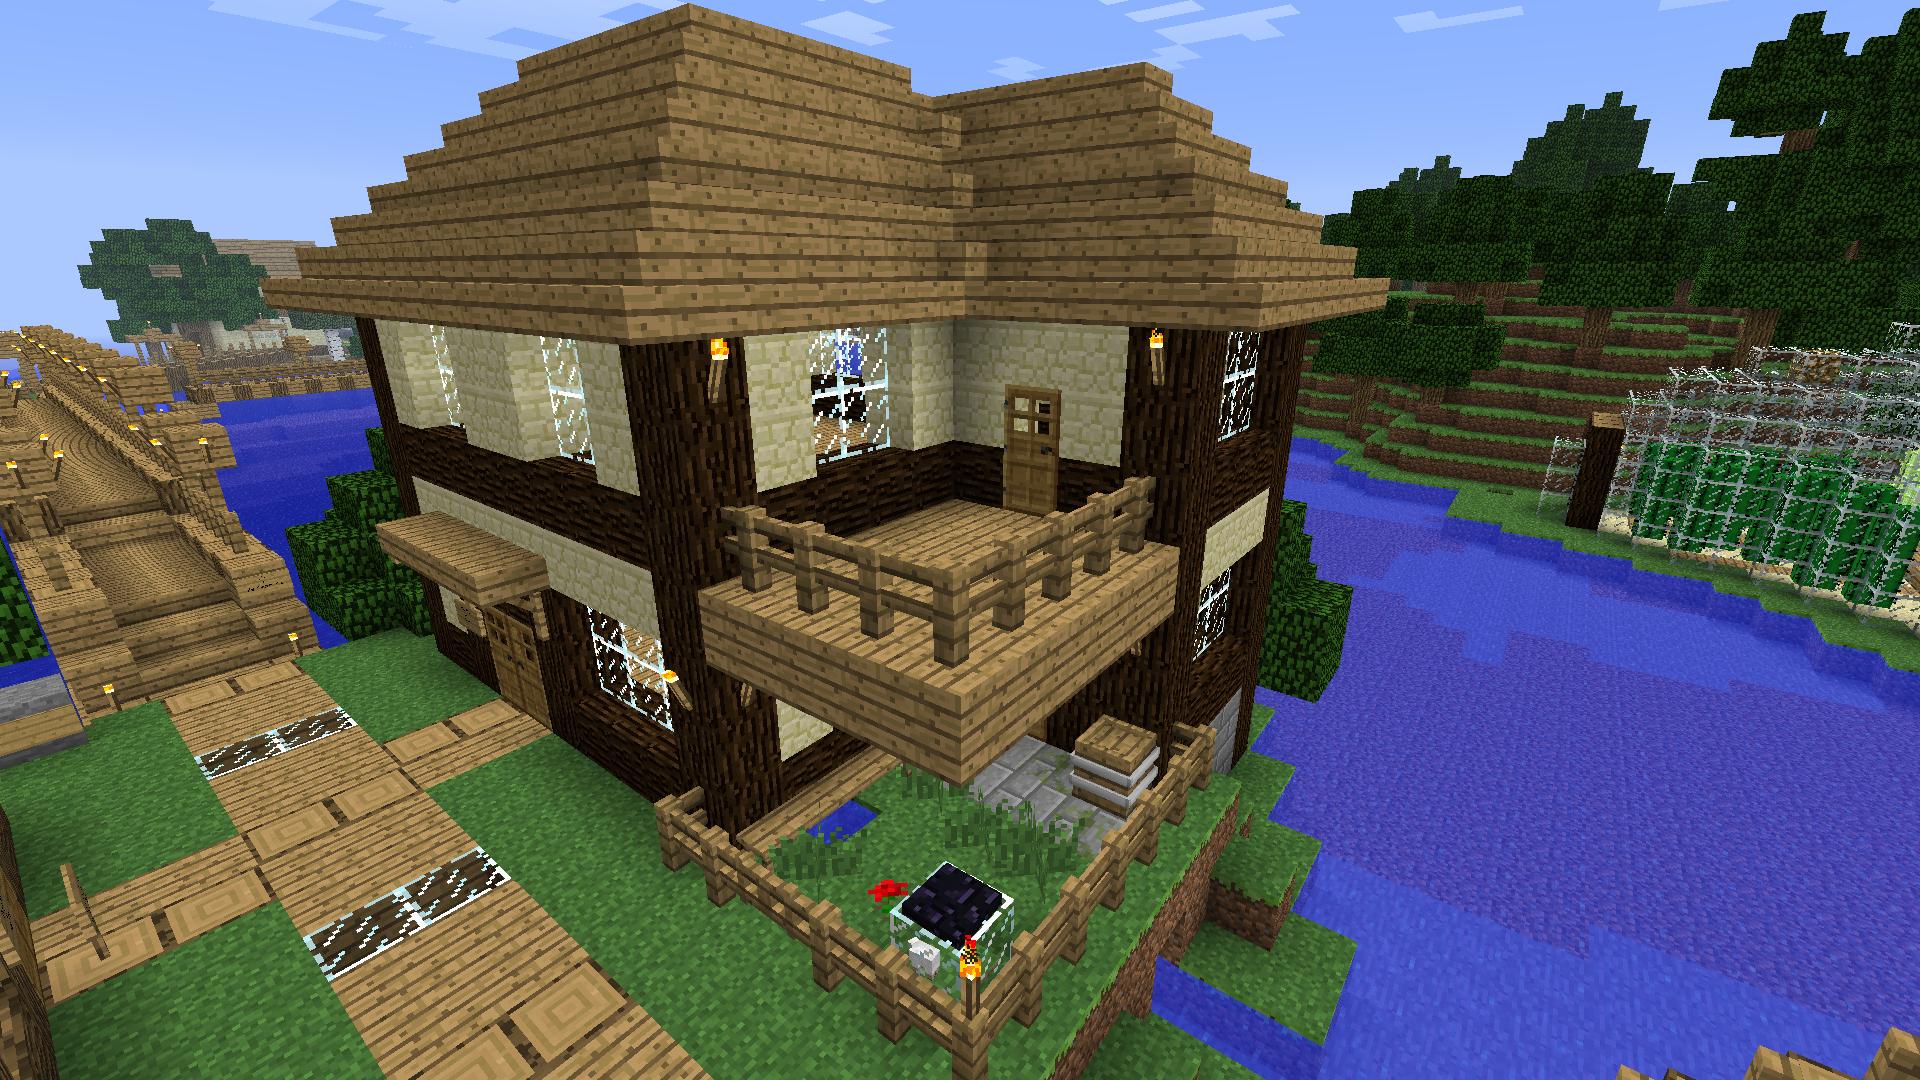 Plan Maison Minecraft Plan Maison Minecraft Maison Minecraft Plan Maison